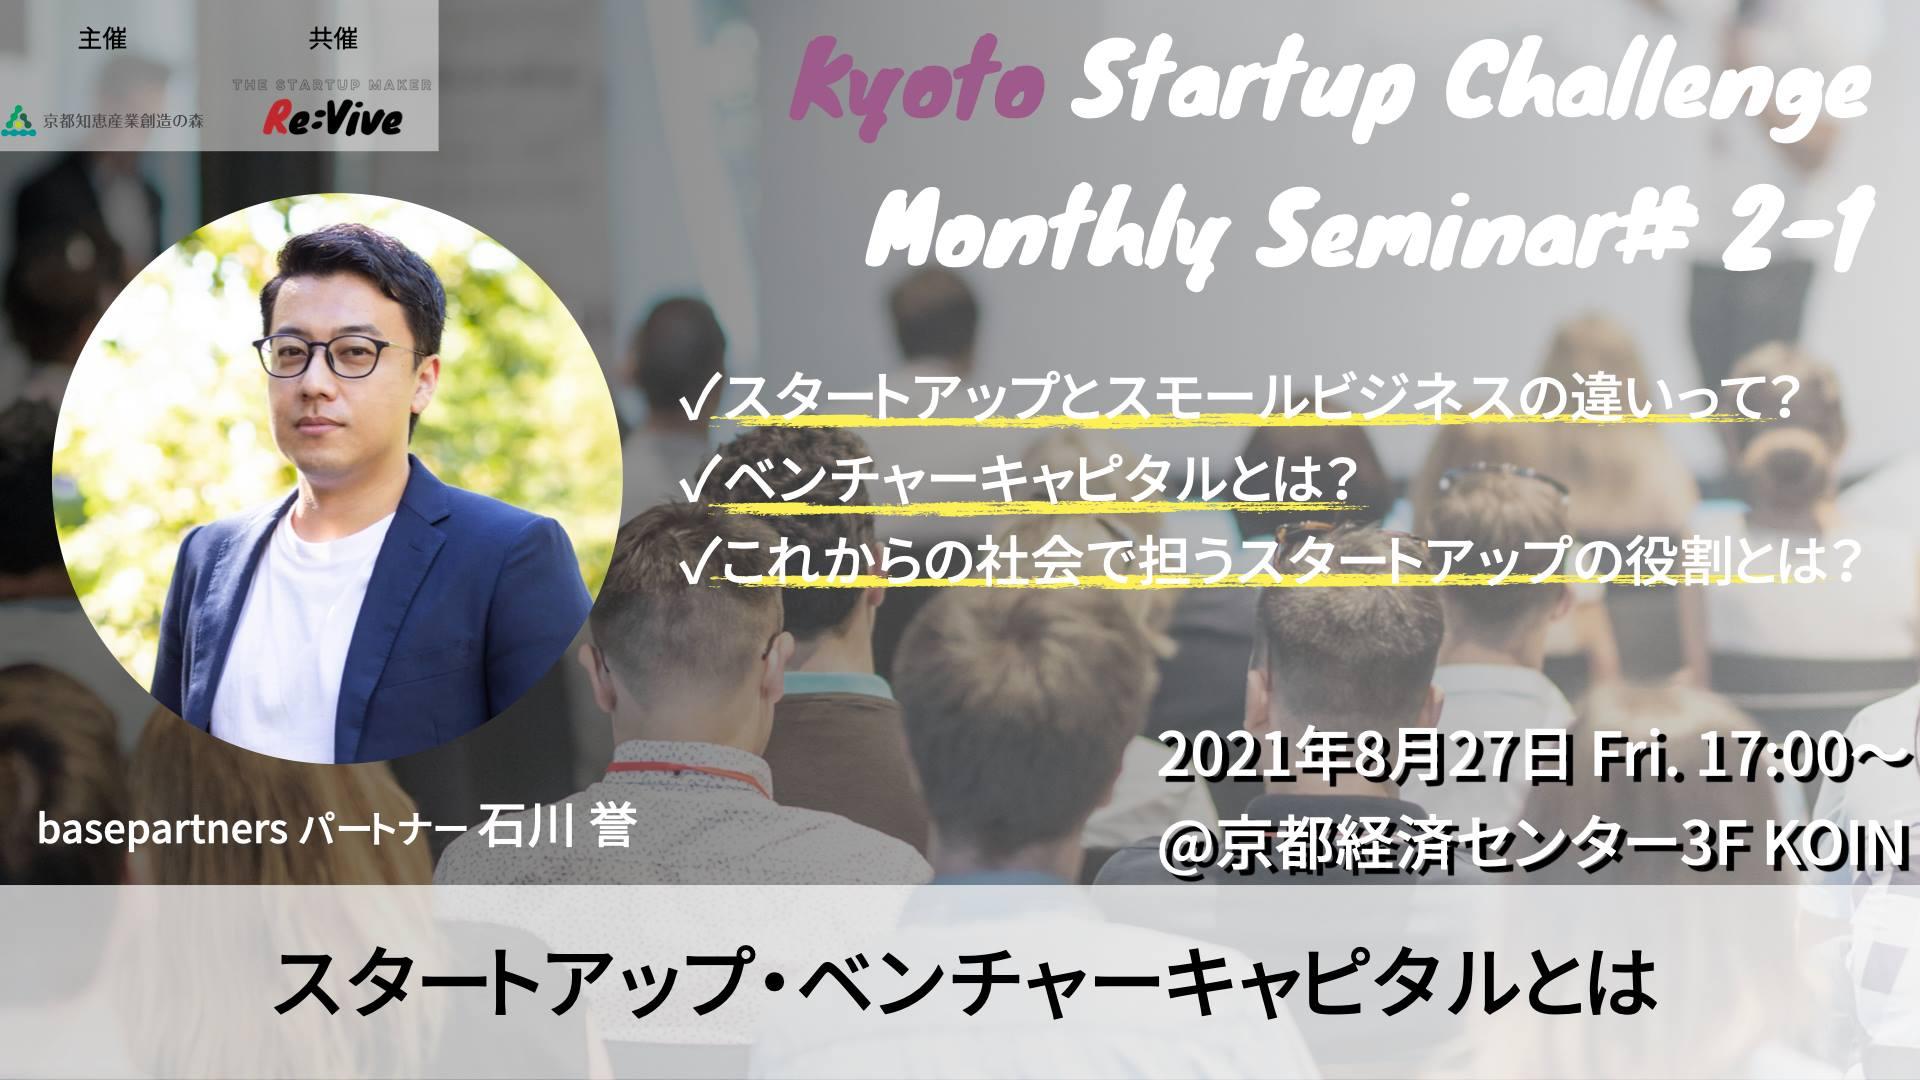 Kyoto Startup Challenge / Seminar 2-1 ~スタートアップやベンチャーキャピタルとは~